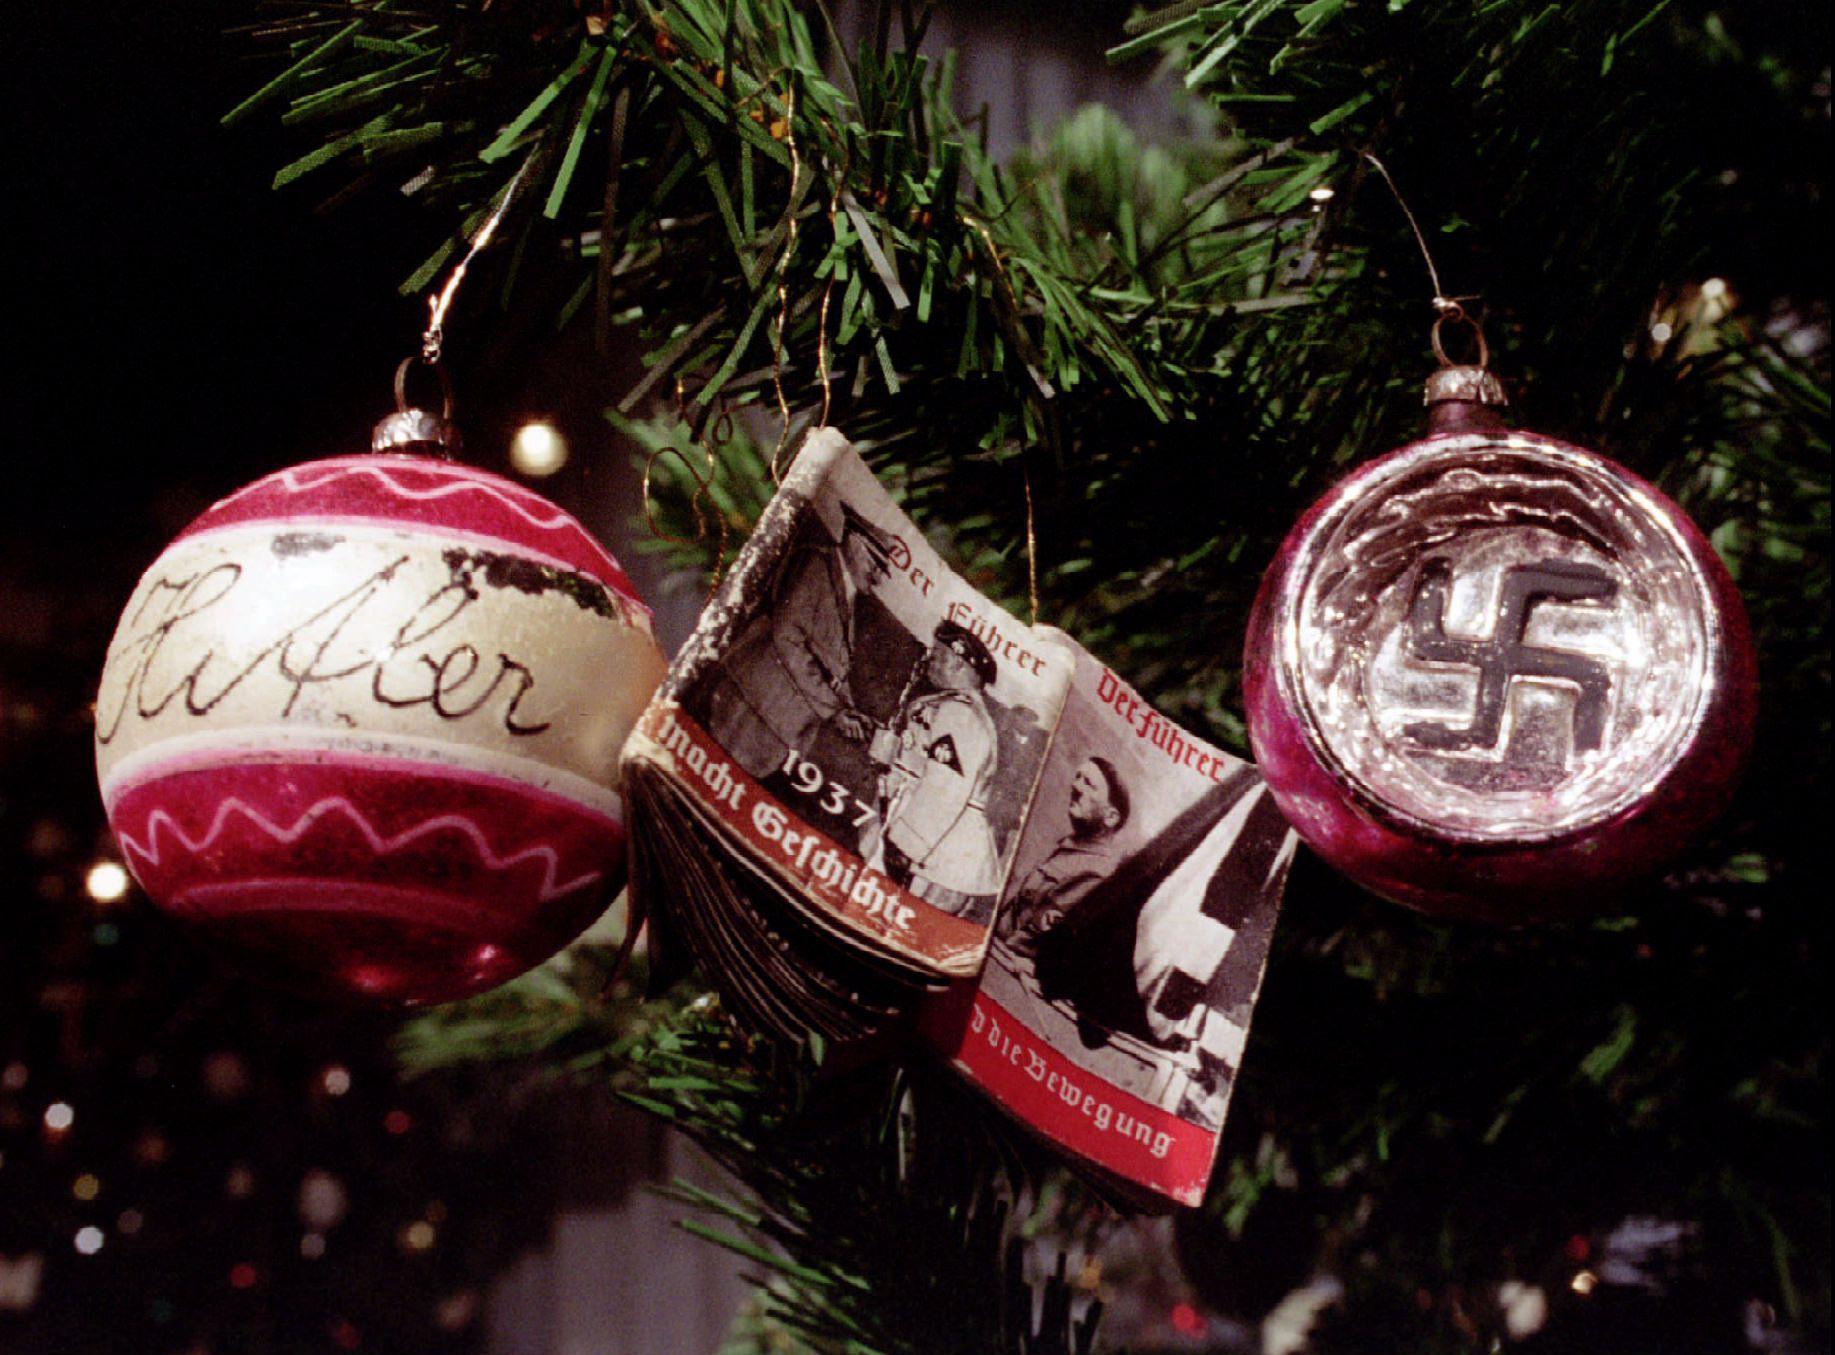 12_23_nazichristmas_01